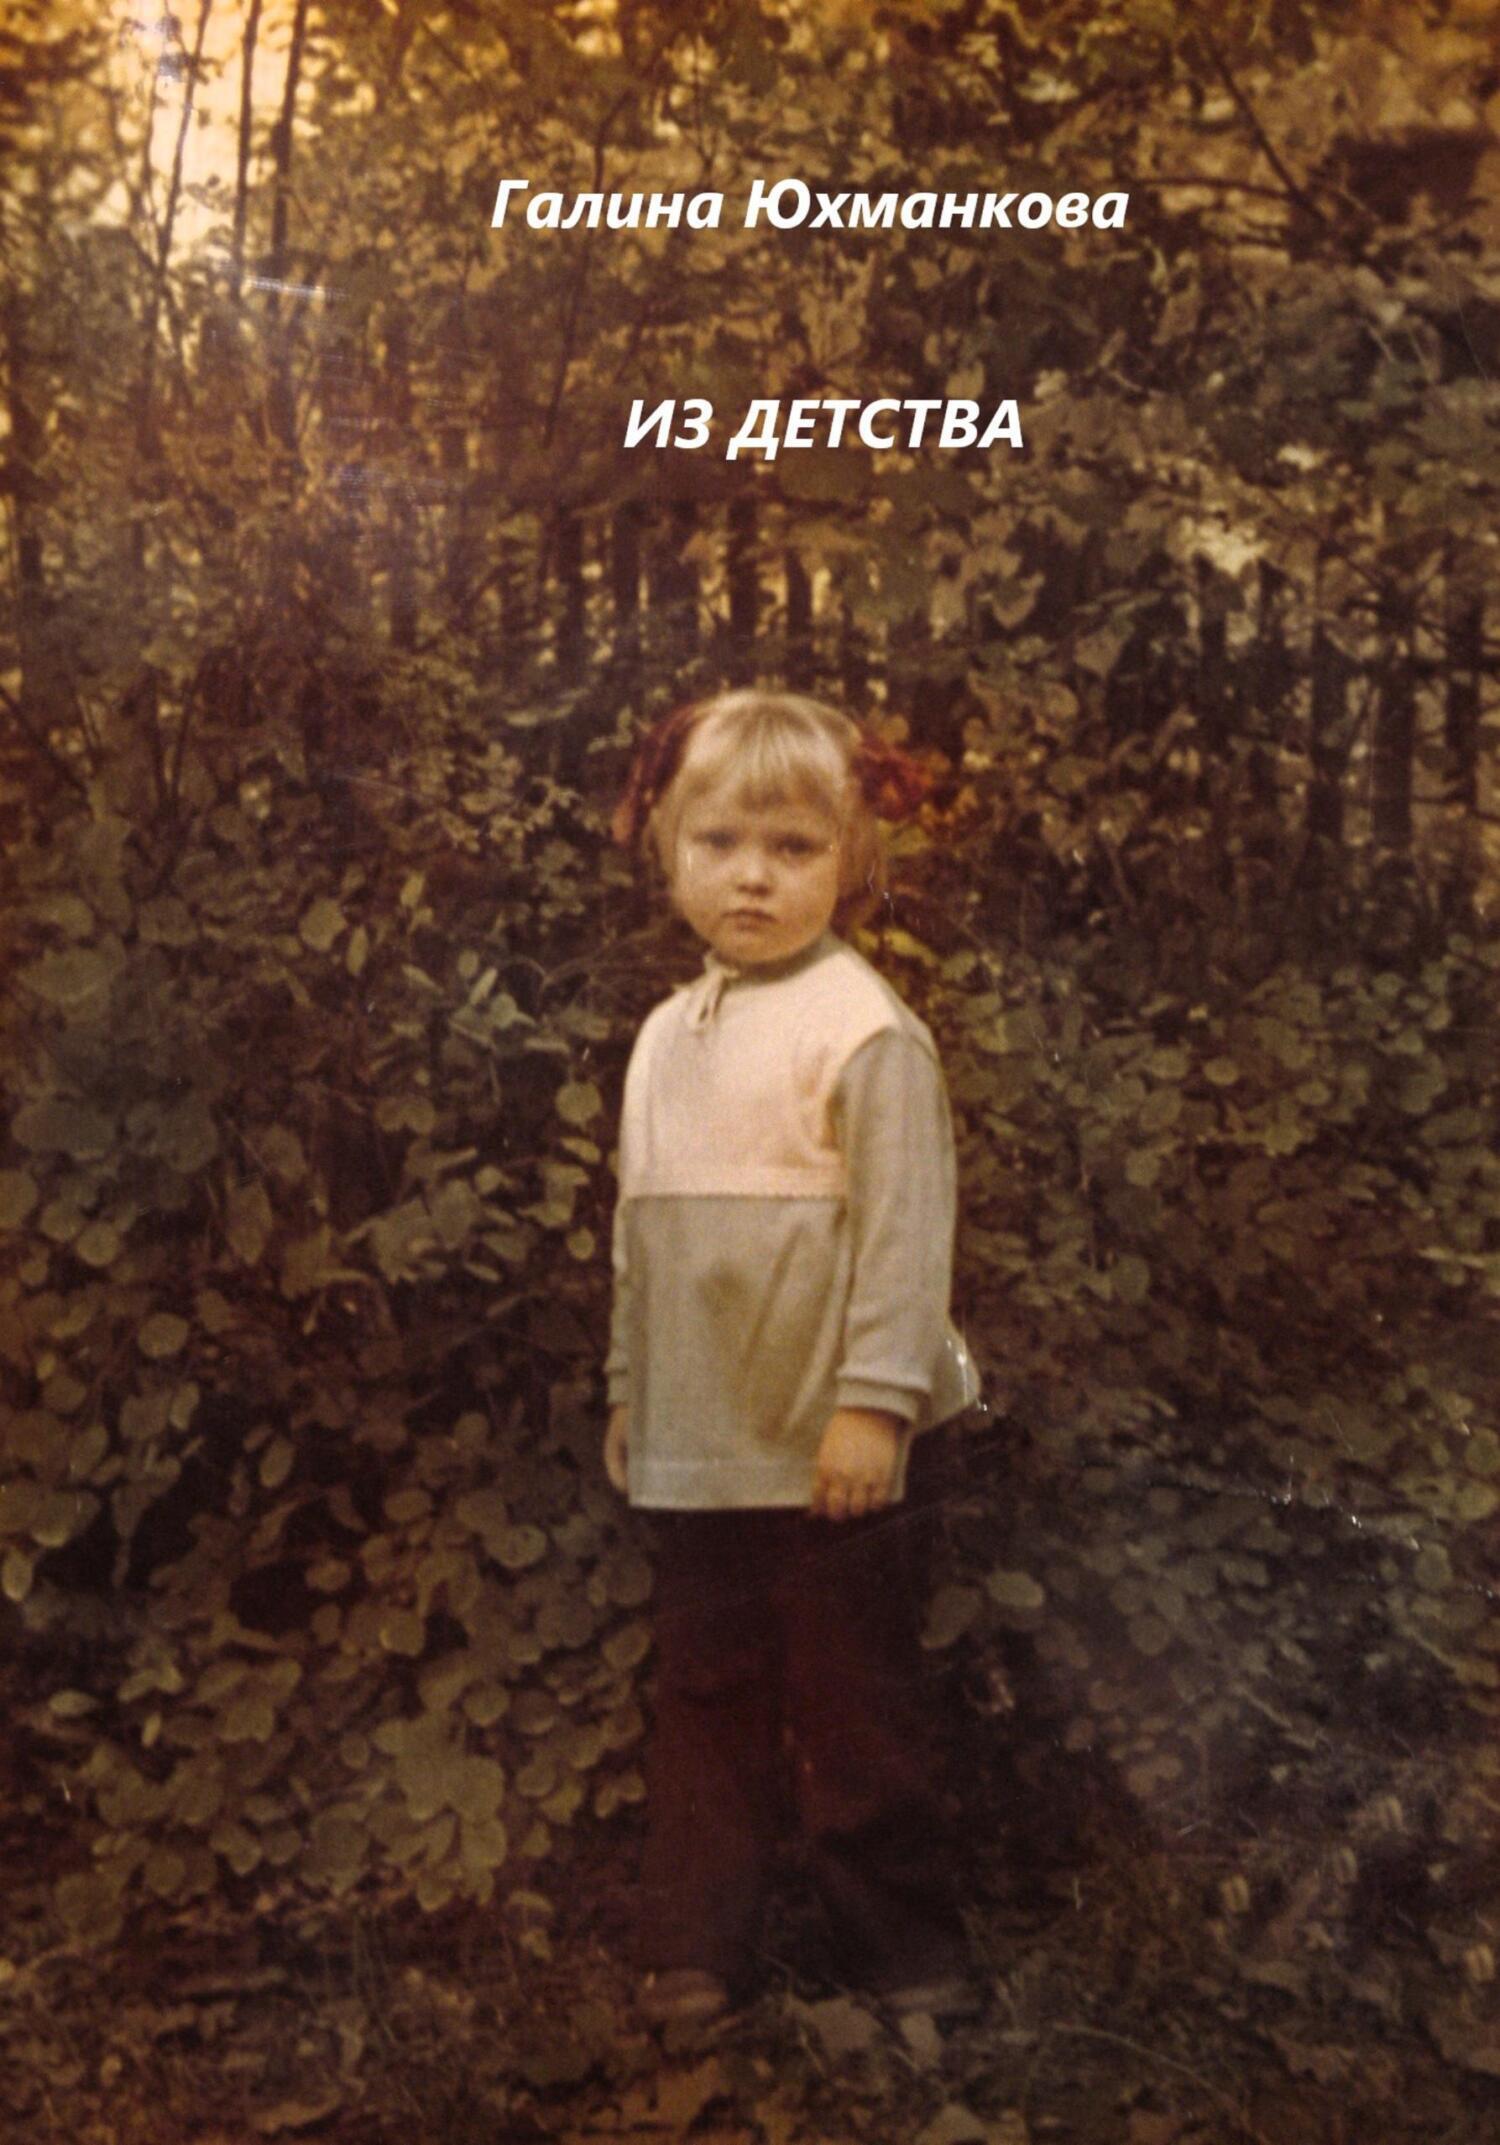 Галина Юрьевна Юхманкова (Лапина) Из детства